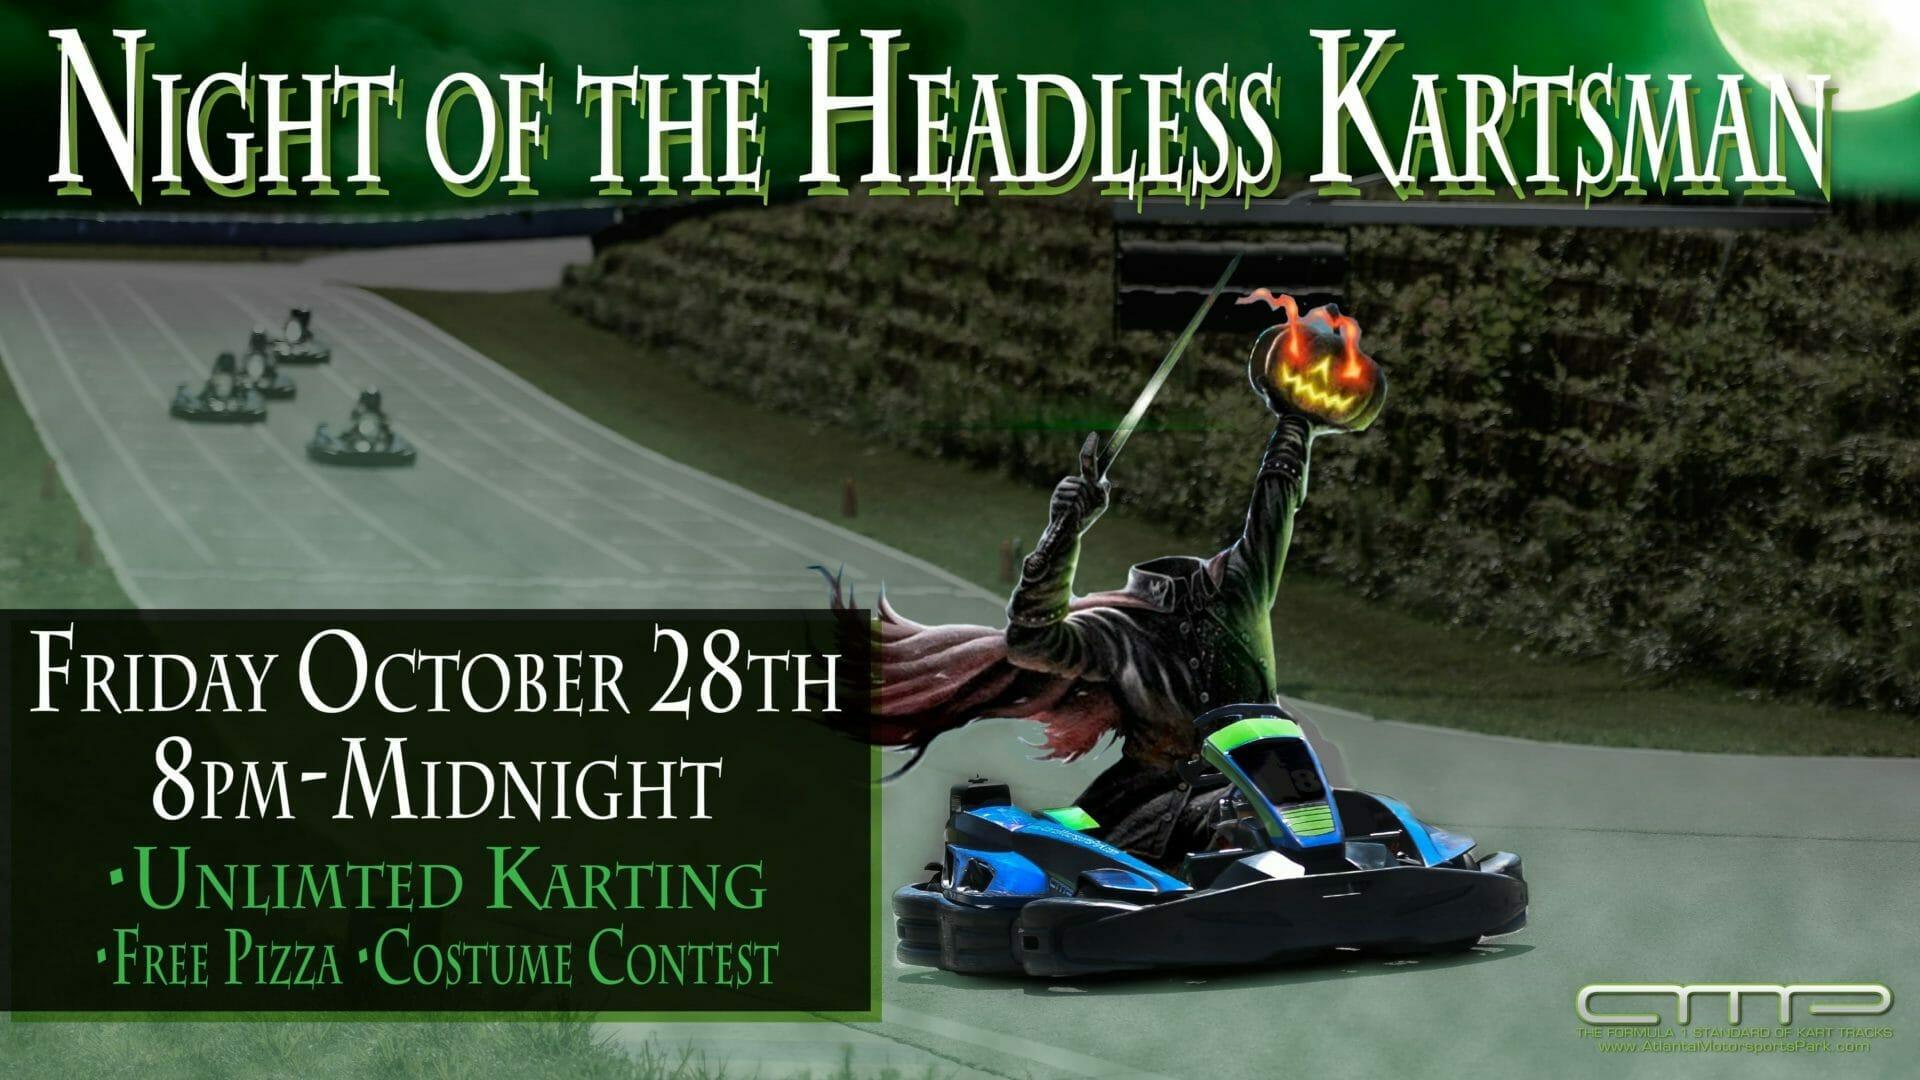 Halloween - Oct 28: Night of the Headless Kartsman